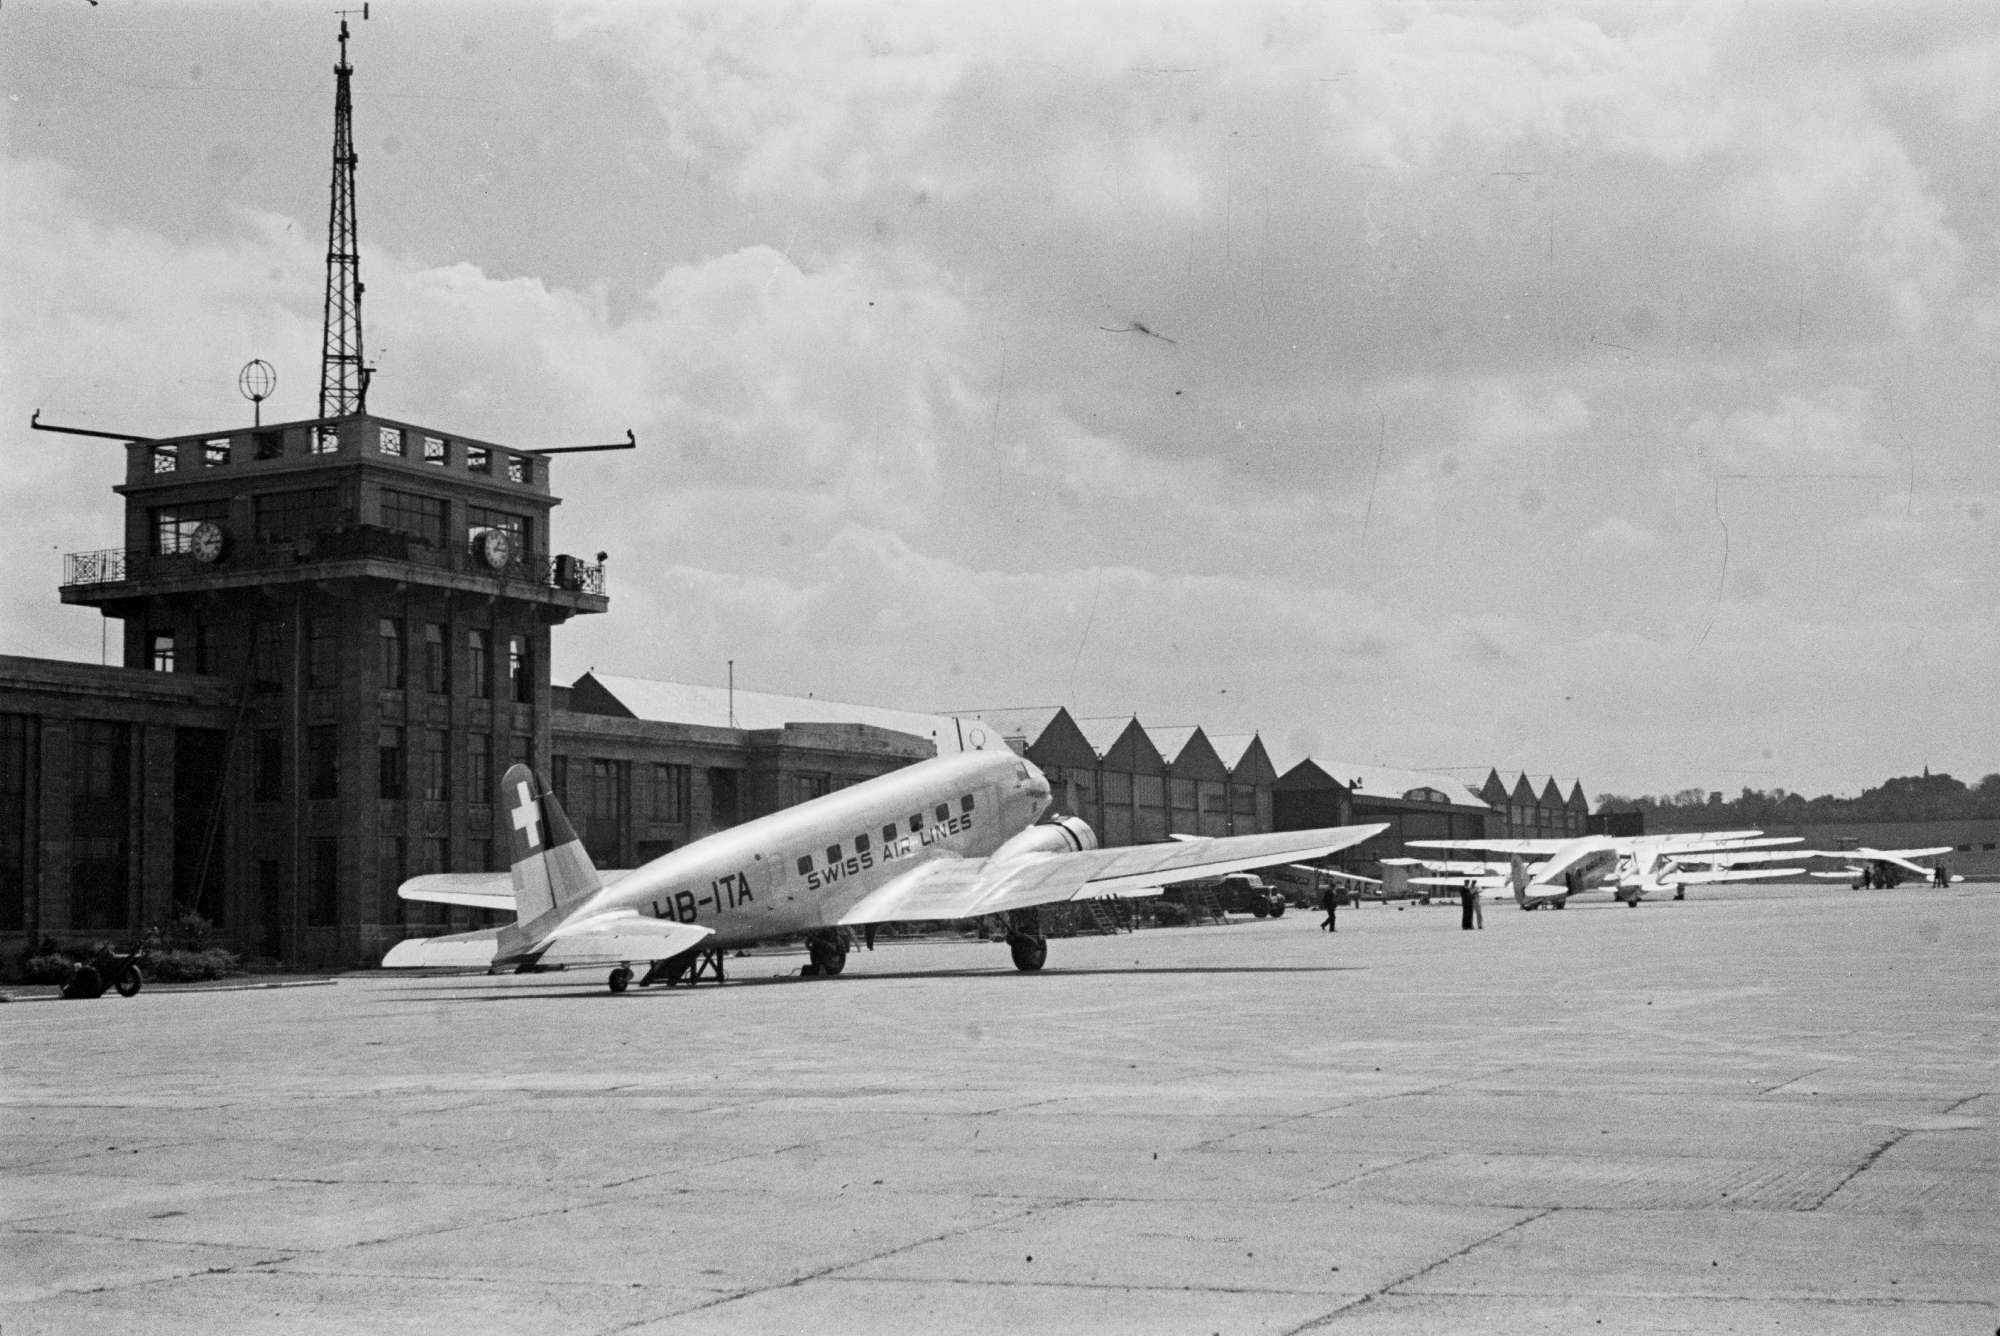 Flughafen London Croydon, Swiss Air Lines DC-2 HB-ITA, De Havilland DH.89 Dragon Rapide